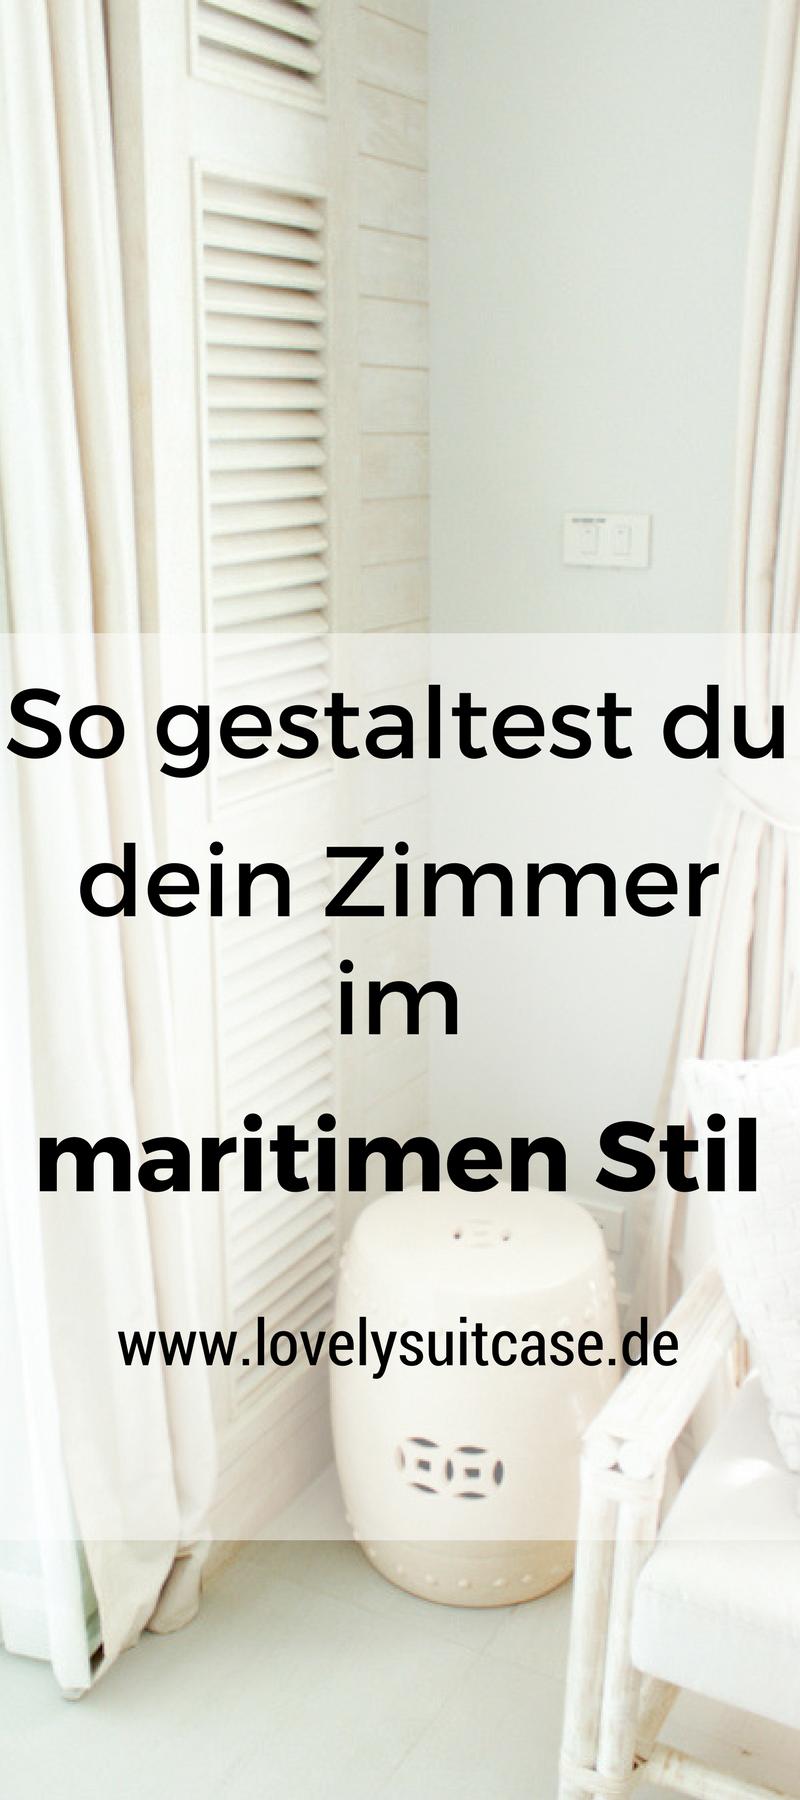 So gestaltest du dein Zimmer im maritimen Stil | Lovely Suitcase ...